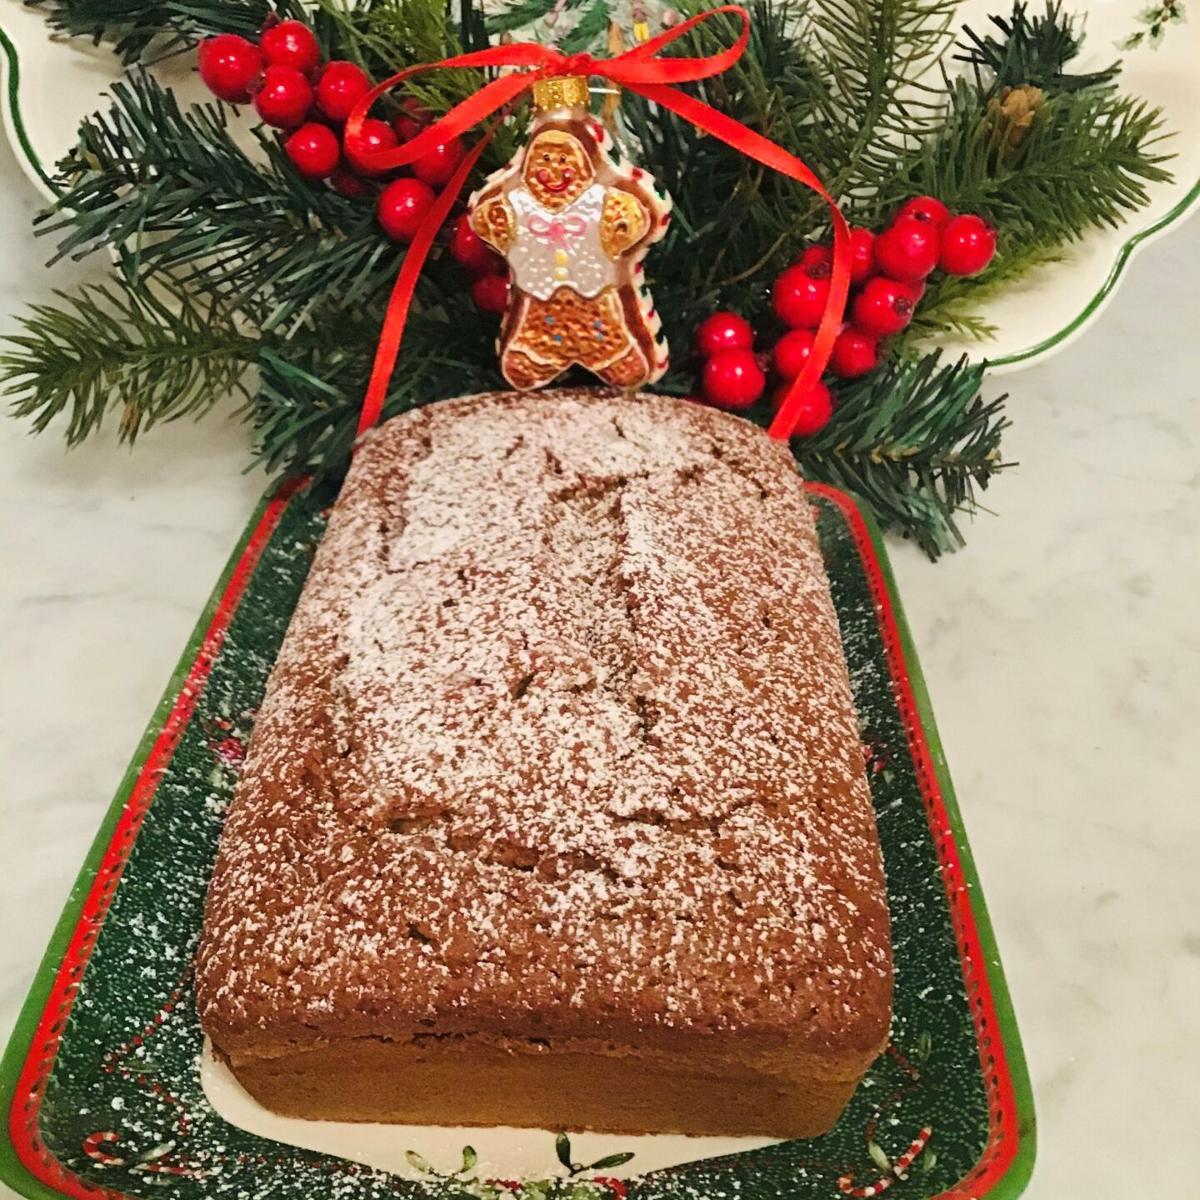 Holiday Gingerbread Loaf